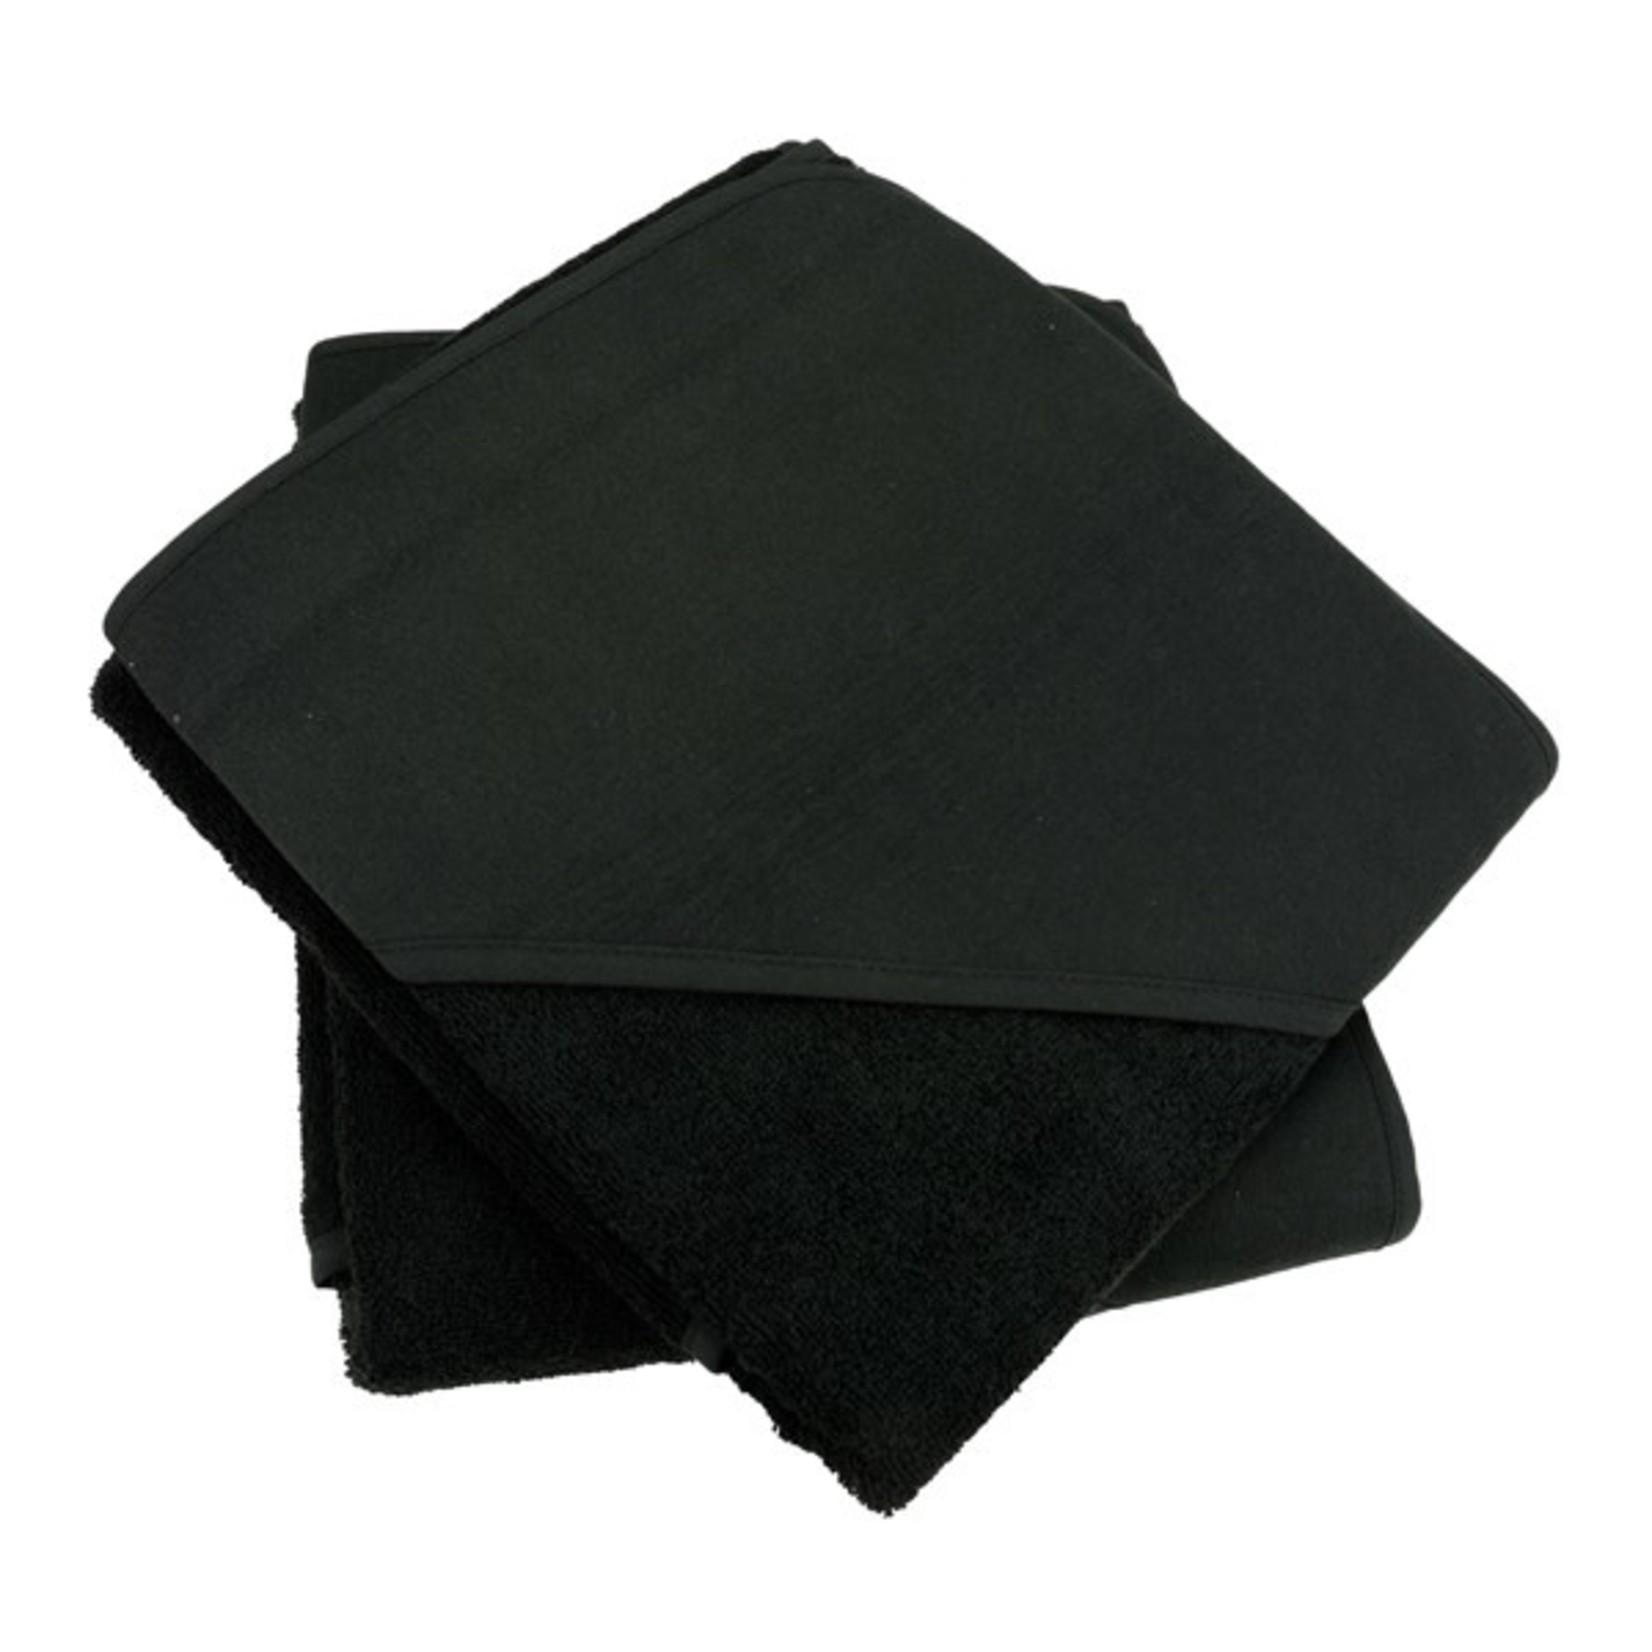 grote badcape Print & borduurbare kap